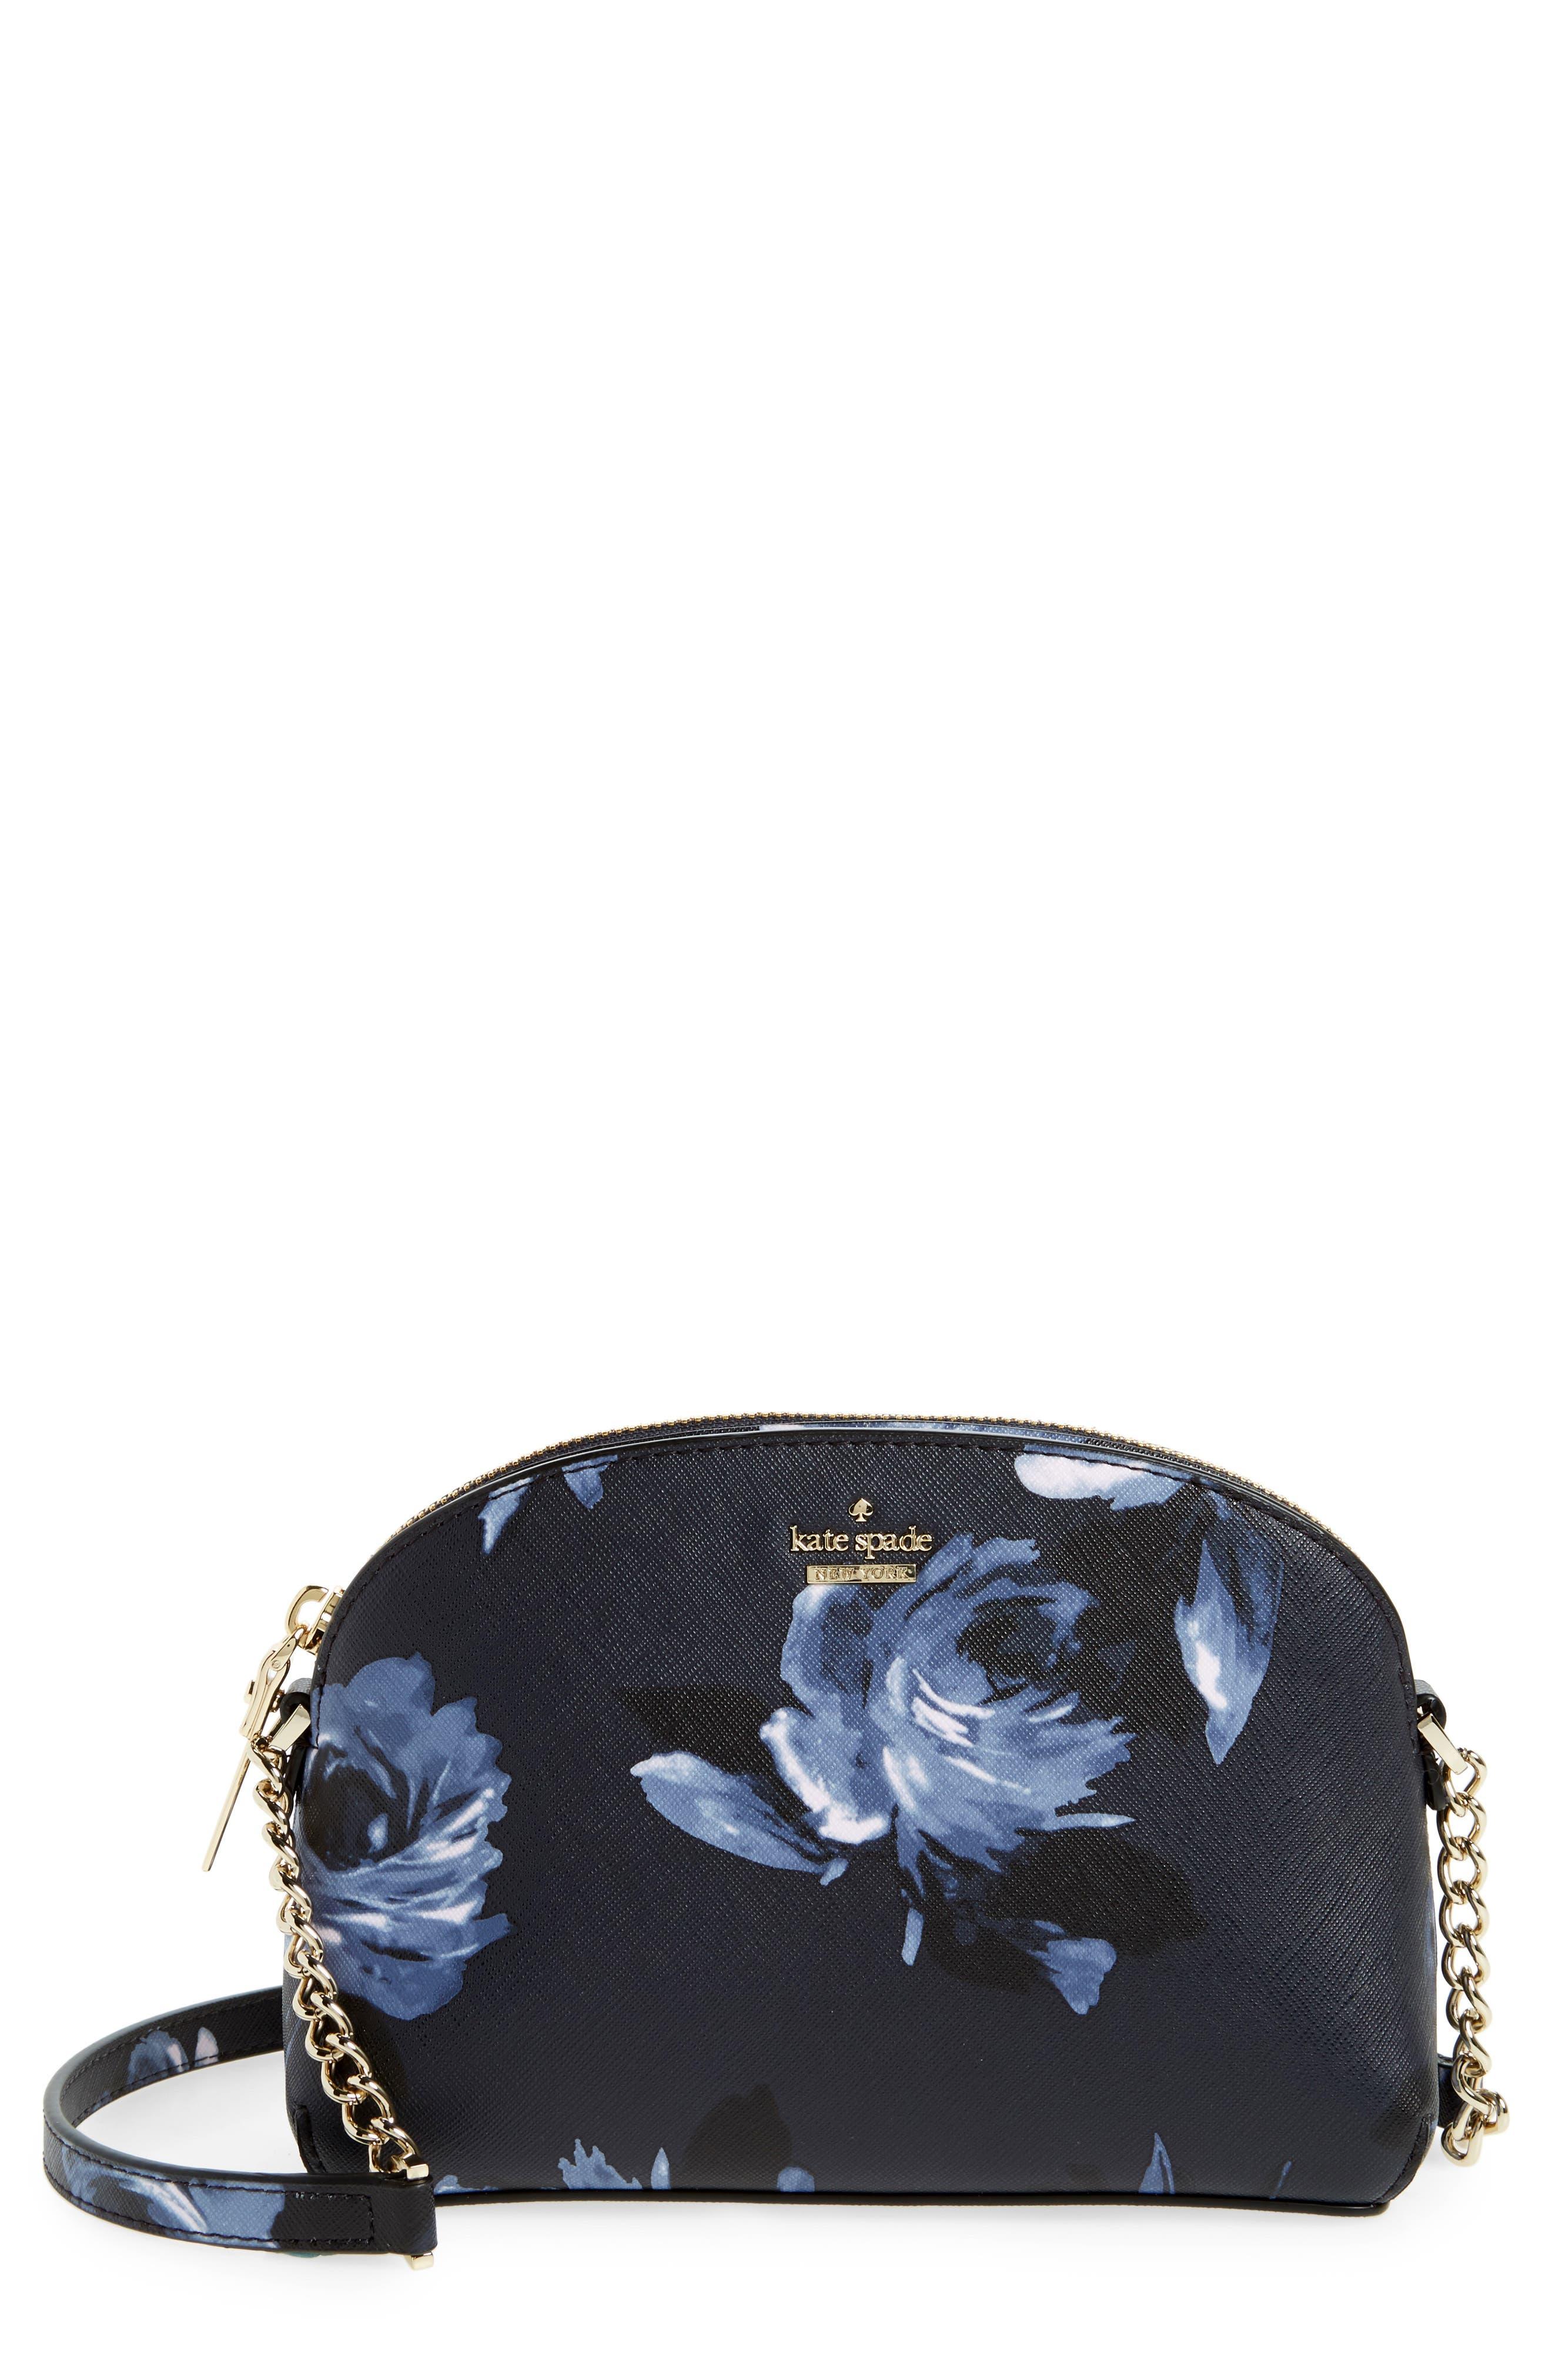 kate spade new york cameron street rose - hilli leather crossbody bag